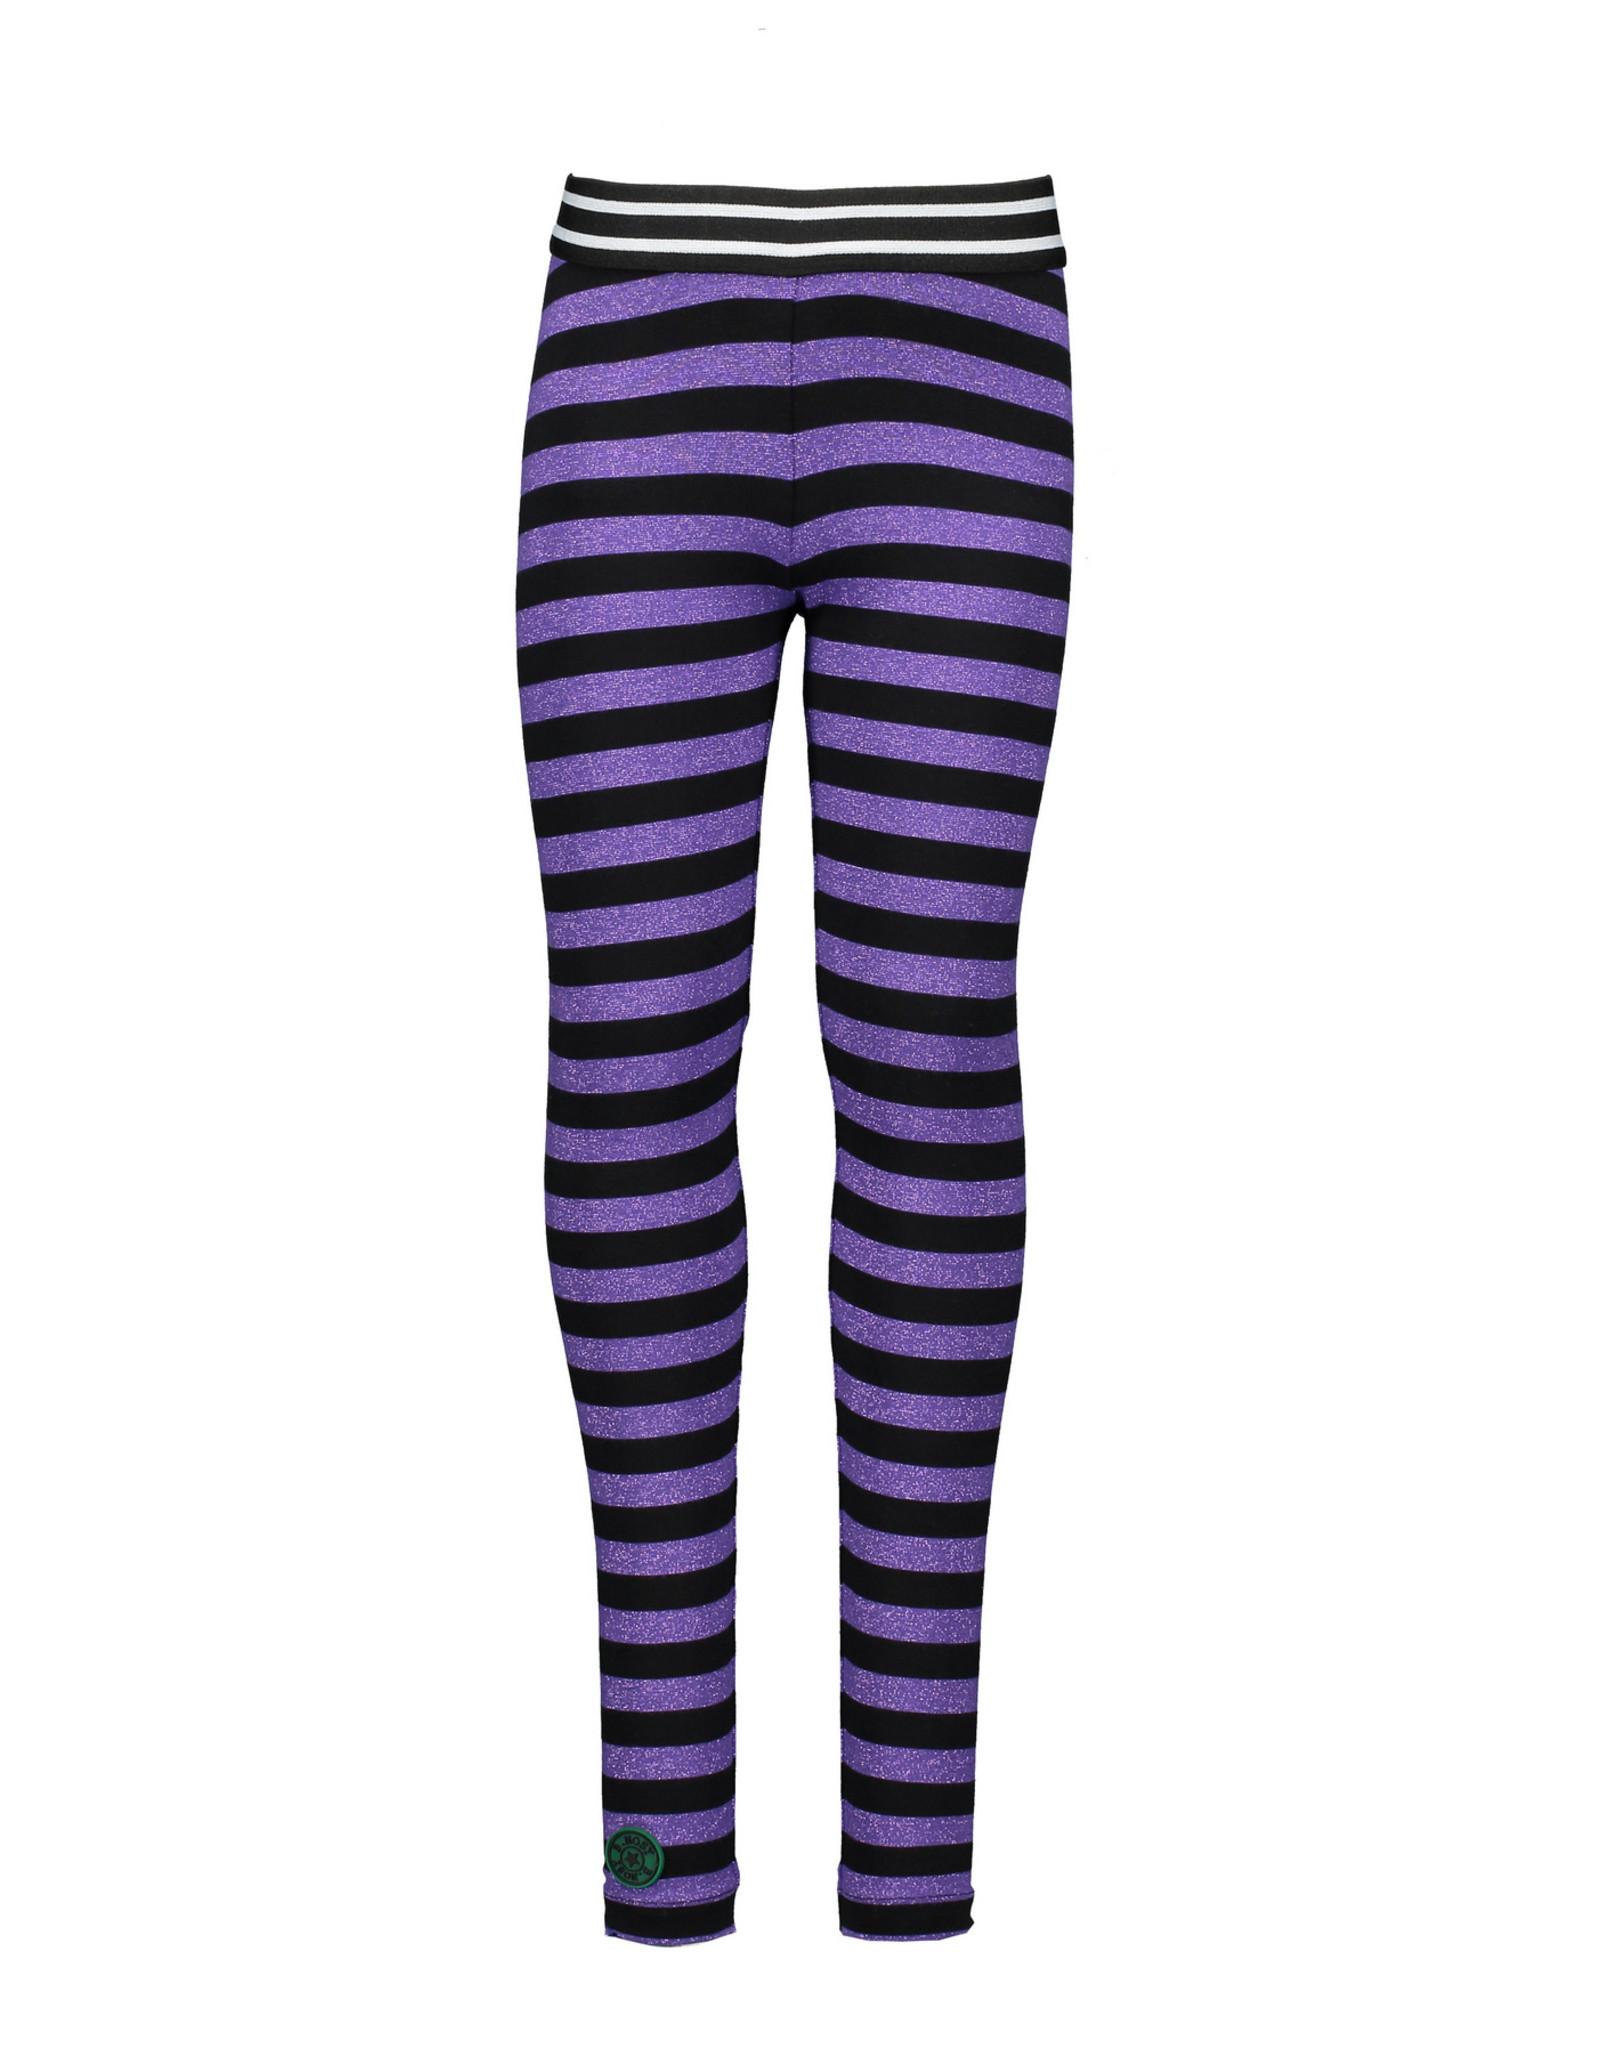 B.Nosy B.Nosy Girls Stripe Legging -Grape Purple